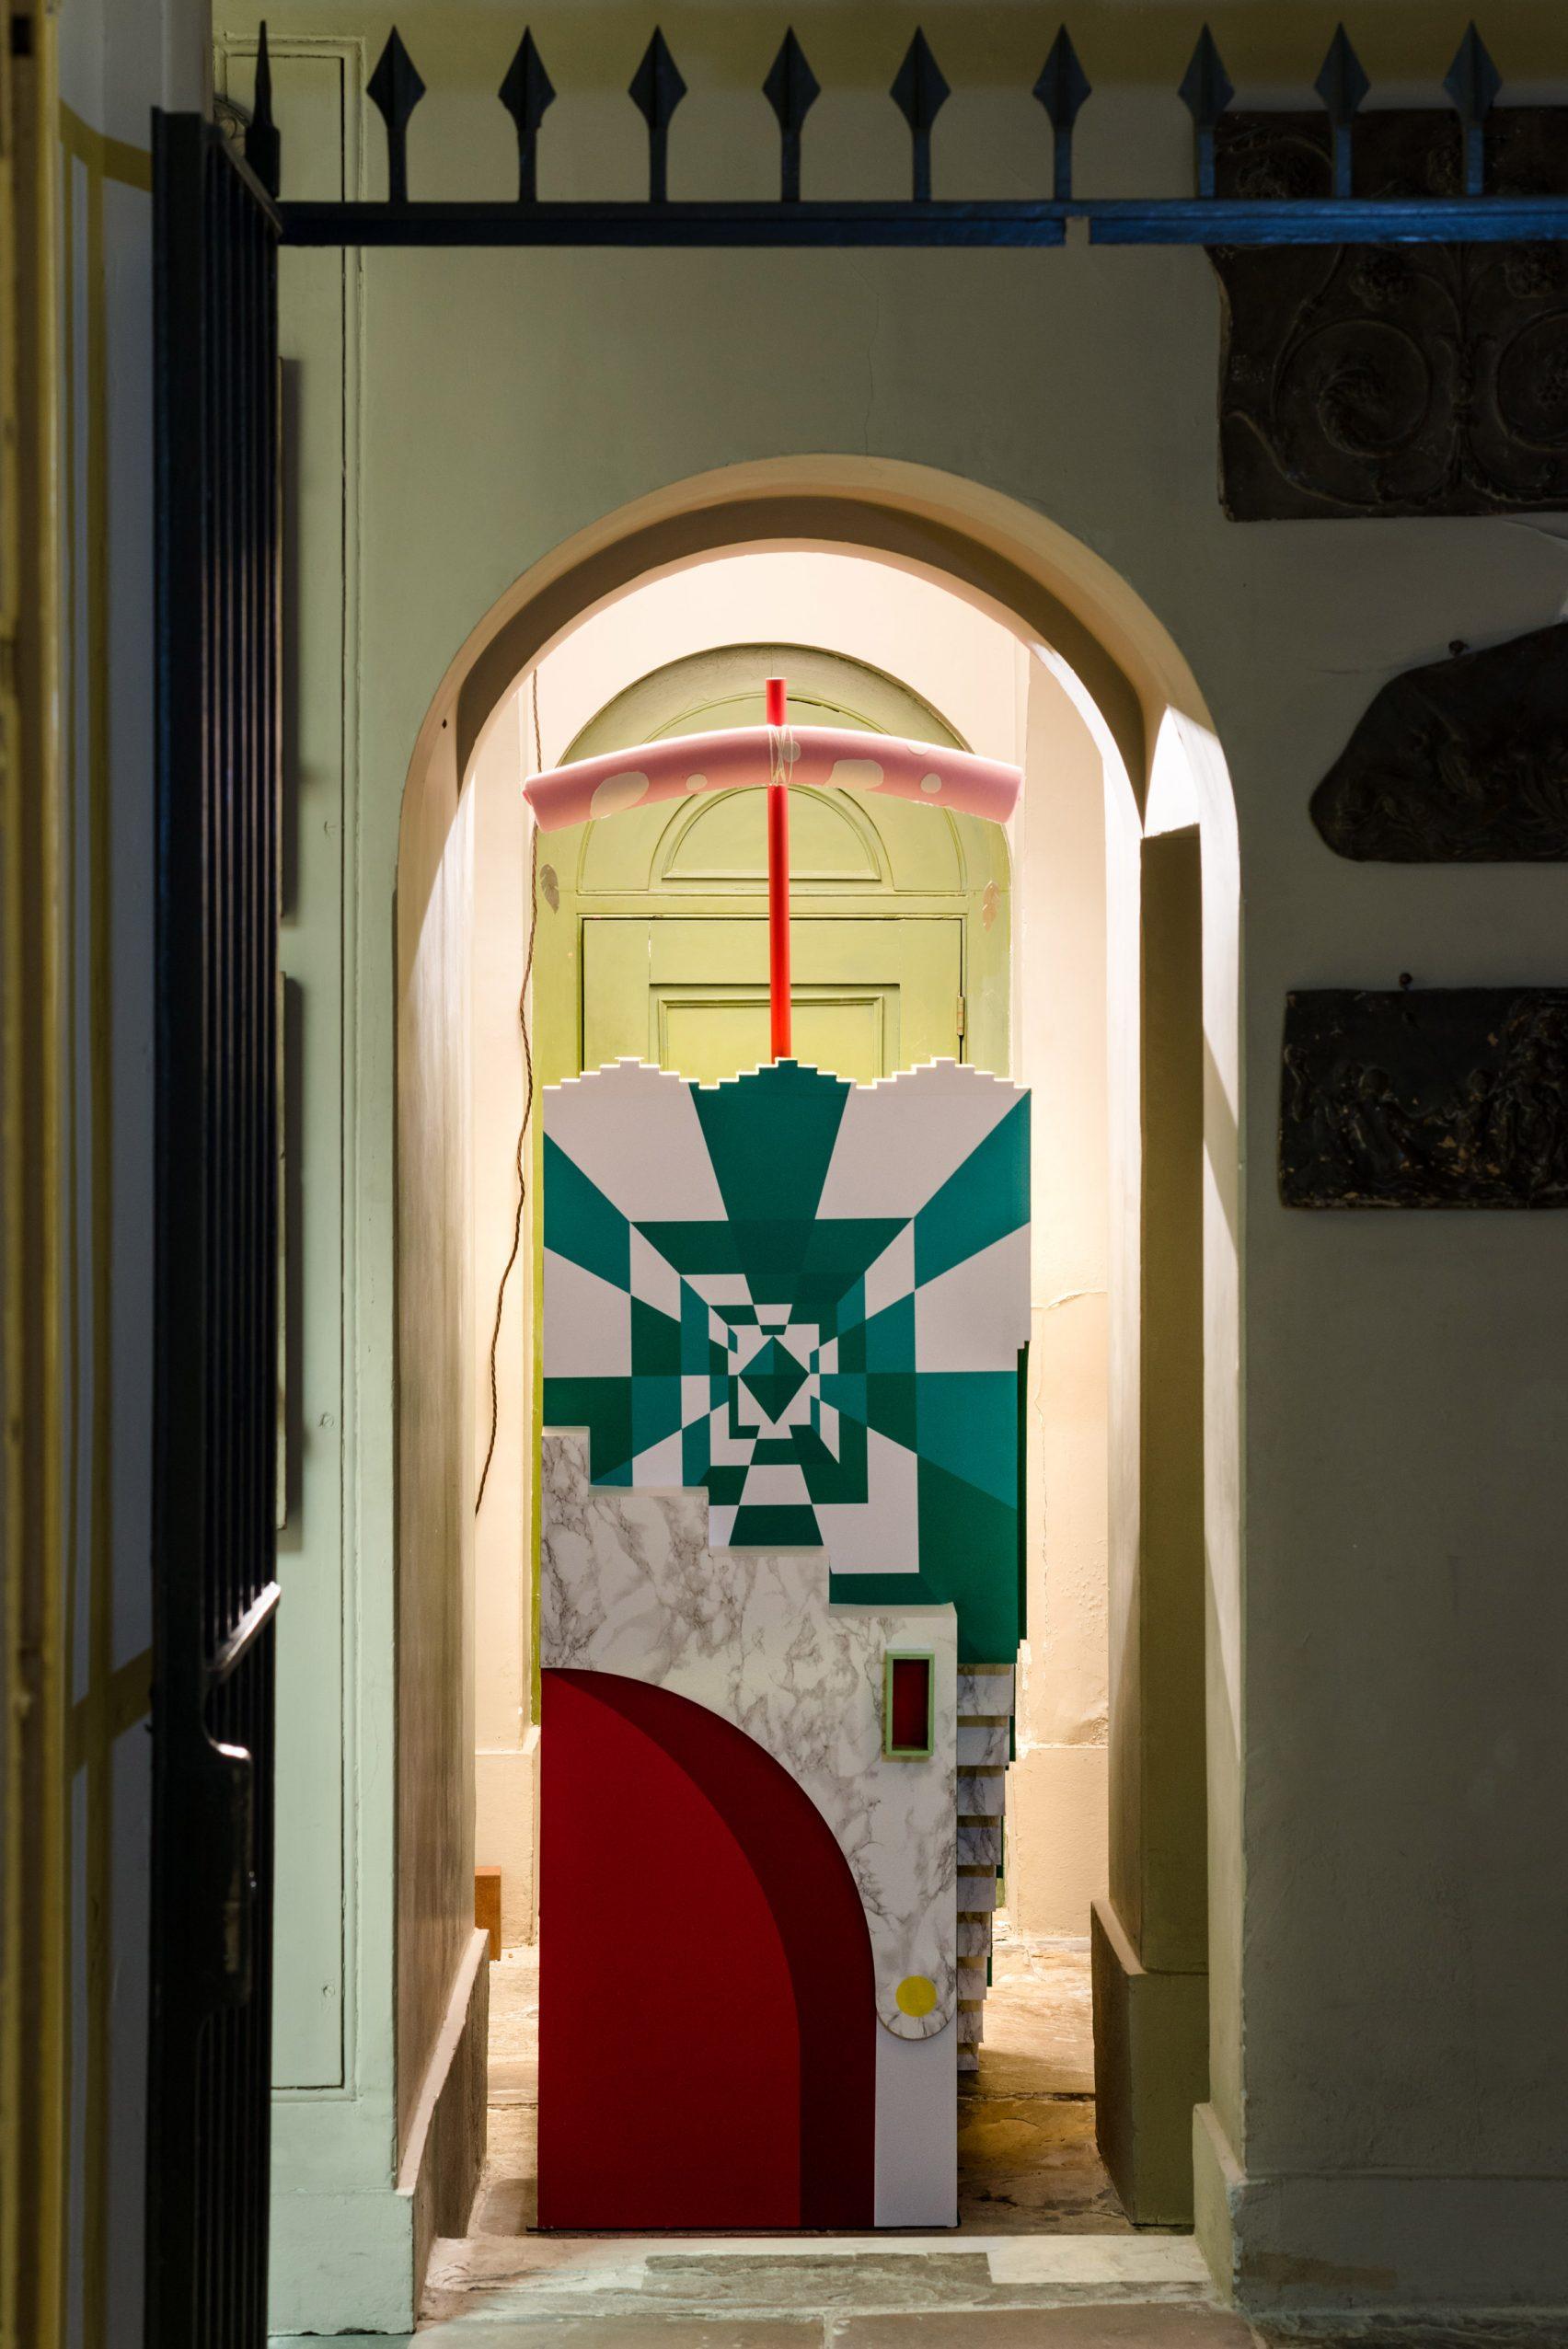 john-soane-architectural-characters-installation-london-uk_dezeen_2364_col_2-1704x2553.jpg